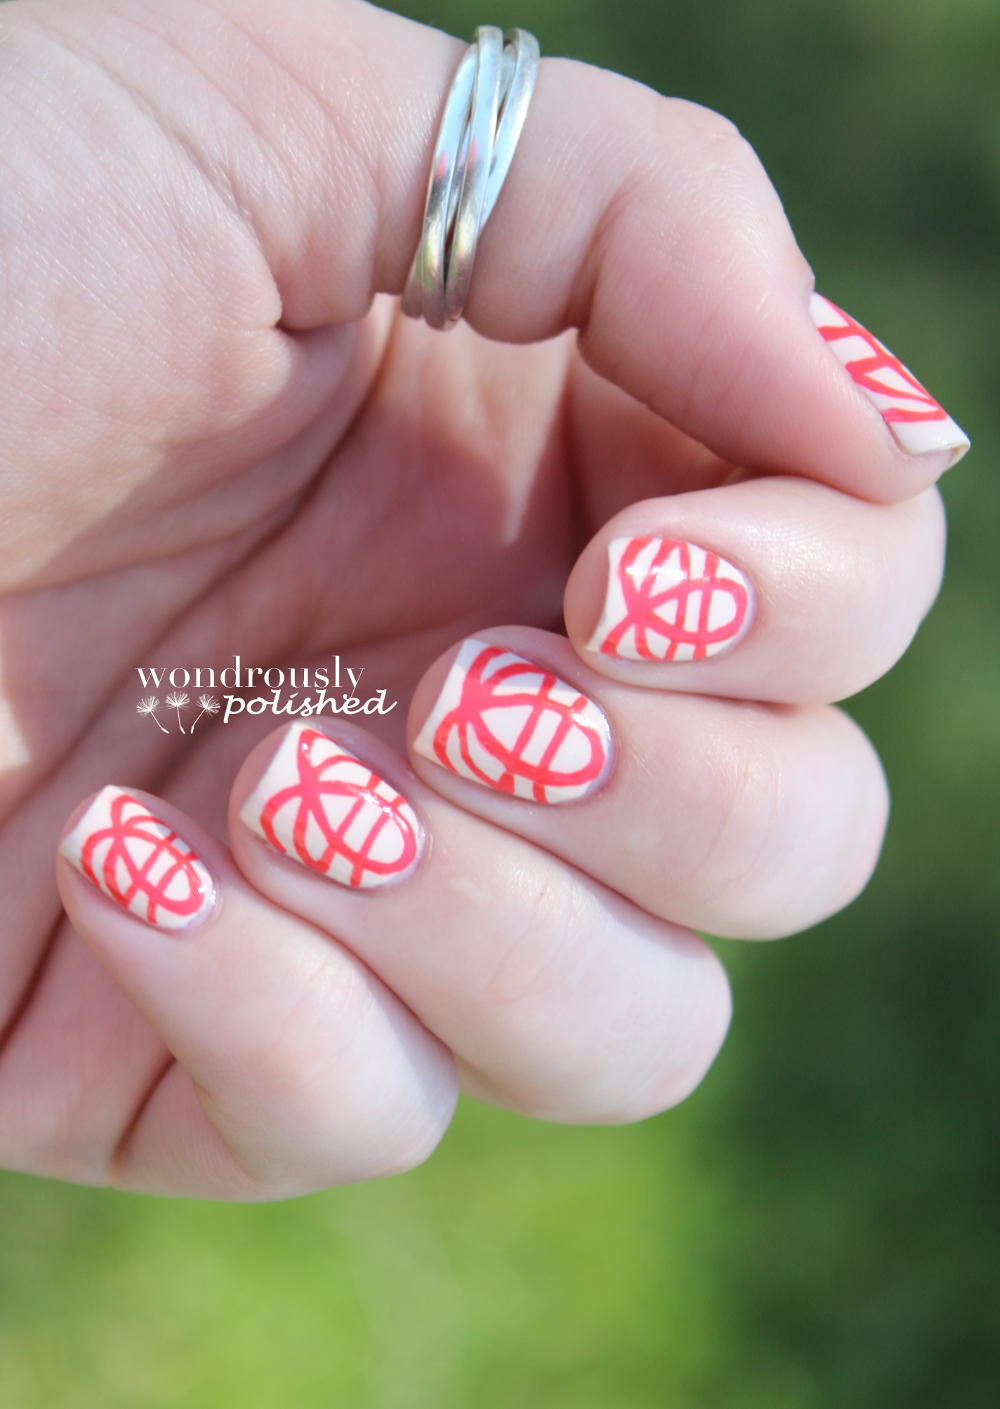 Wondrously Polished April Nail Art Challenge: Wondrously Polished: May Nail Art Challenge